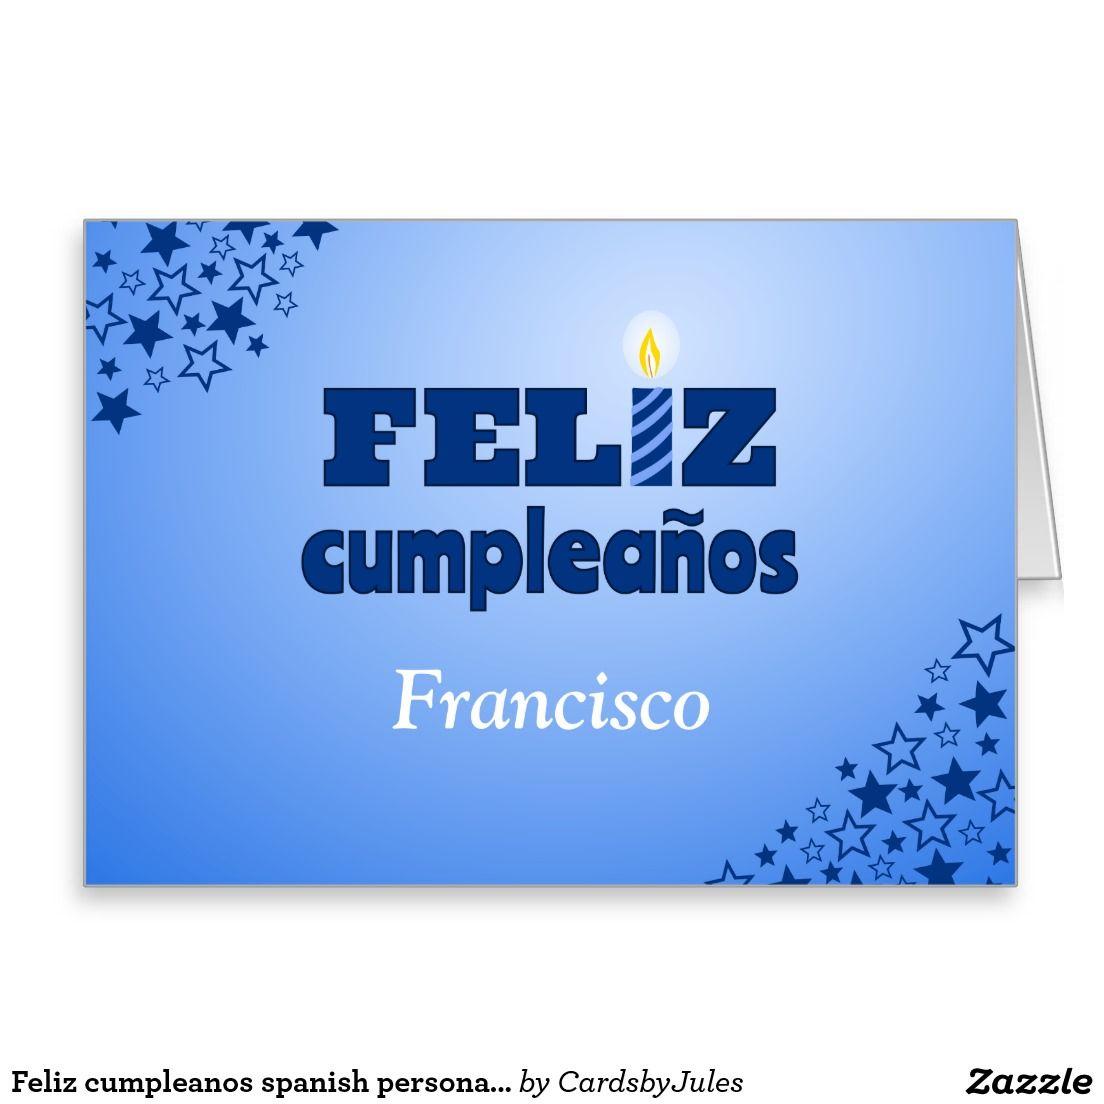 Feliz Cumpleanos Spanish Personalized Birthday Card Zazzle Co Uk Birthday Cards Spanish Birthday Cards Birthday Greeting Cards